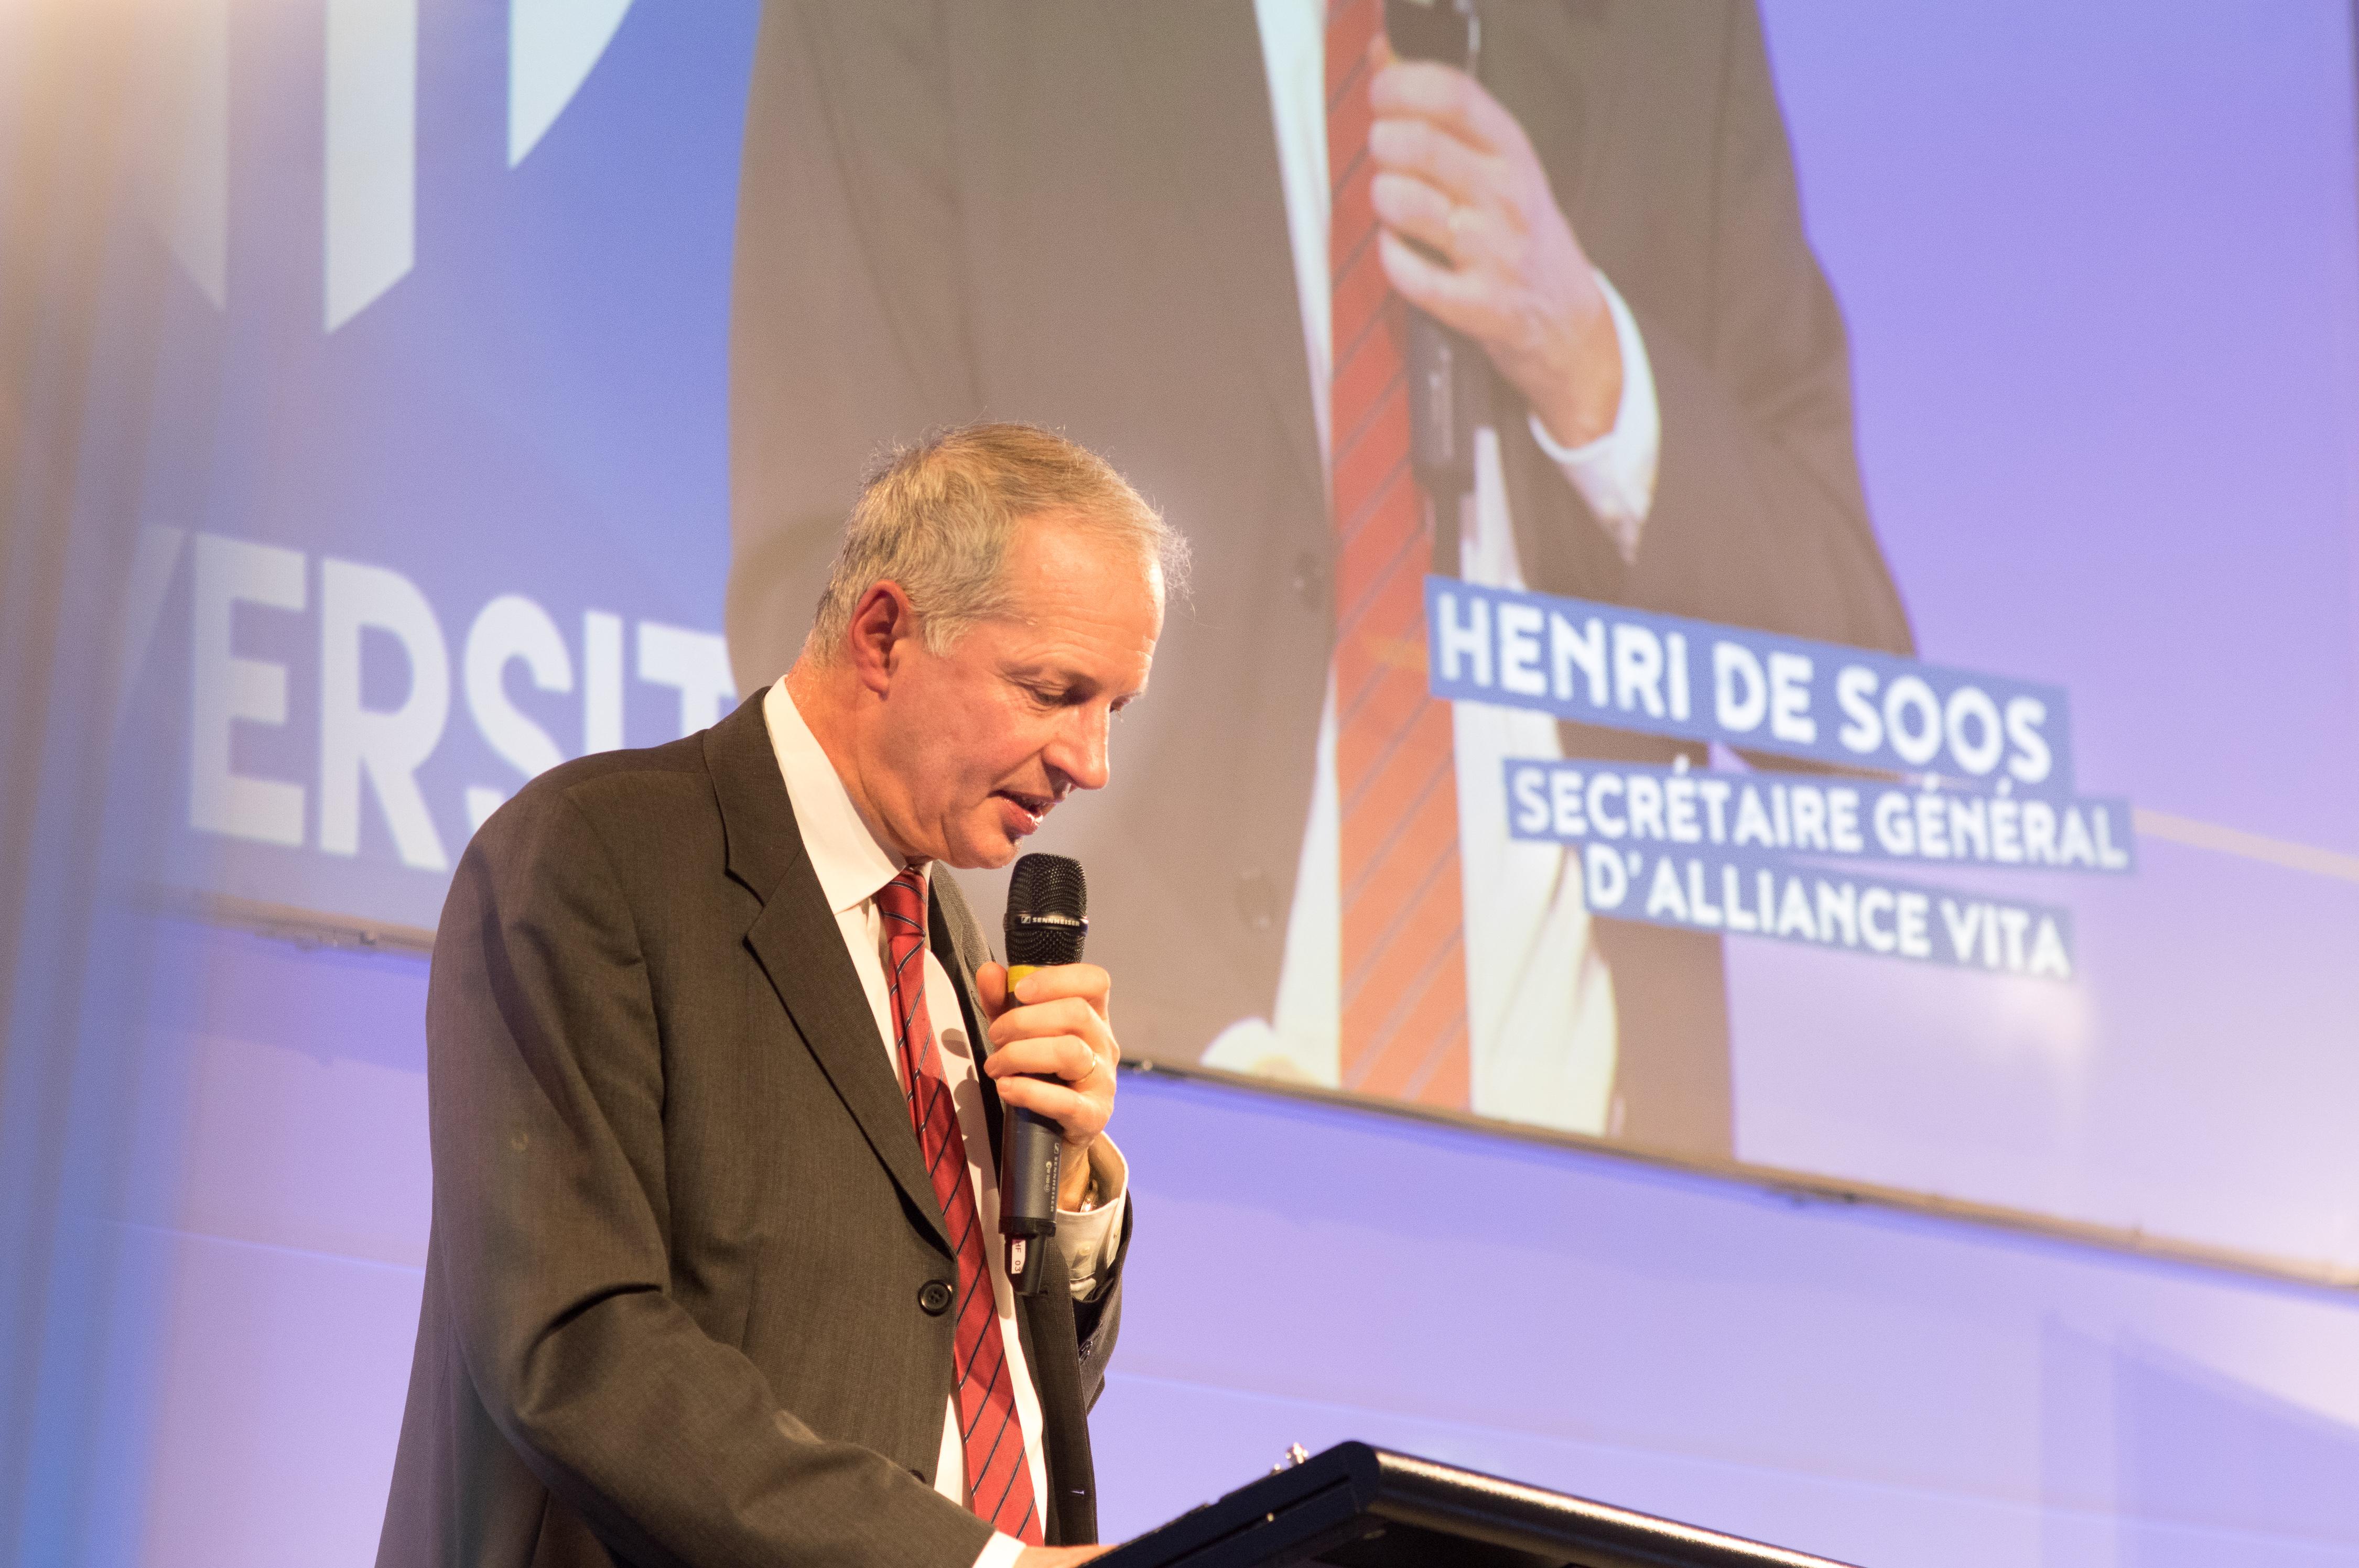 Henri de Soos